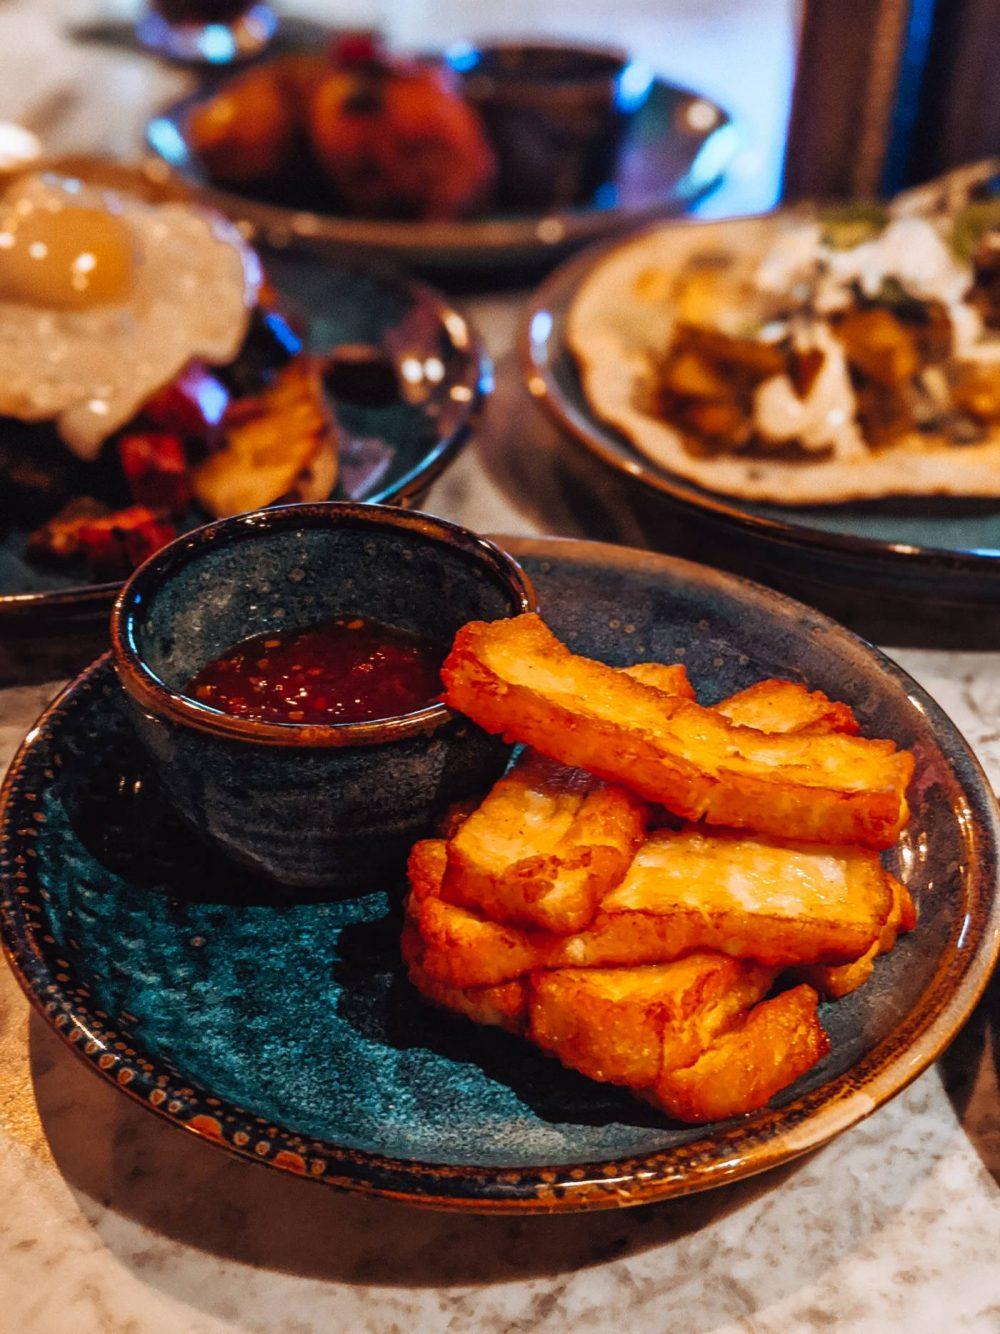 Halloumi fries at The Blossom Room Milton Keynes